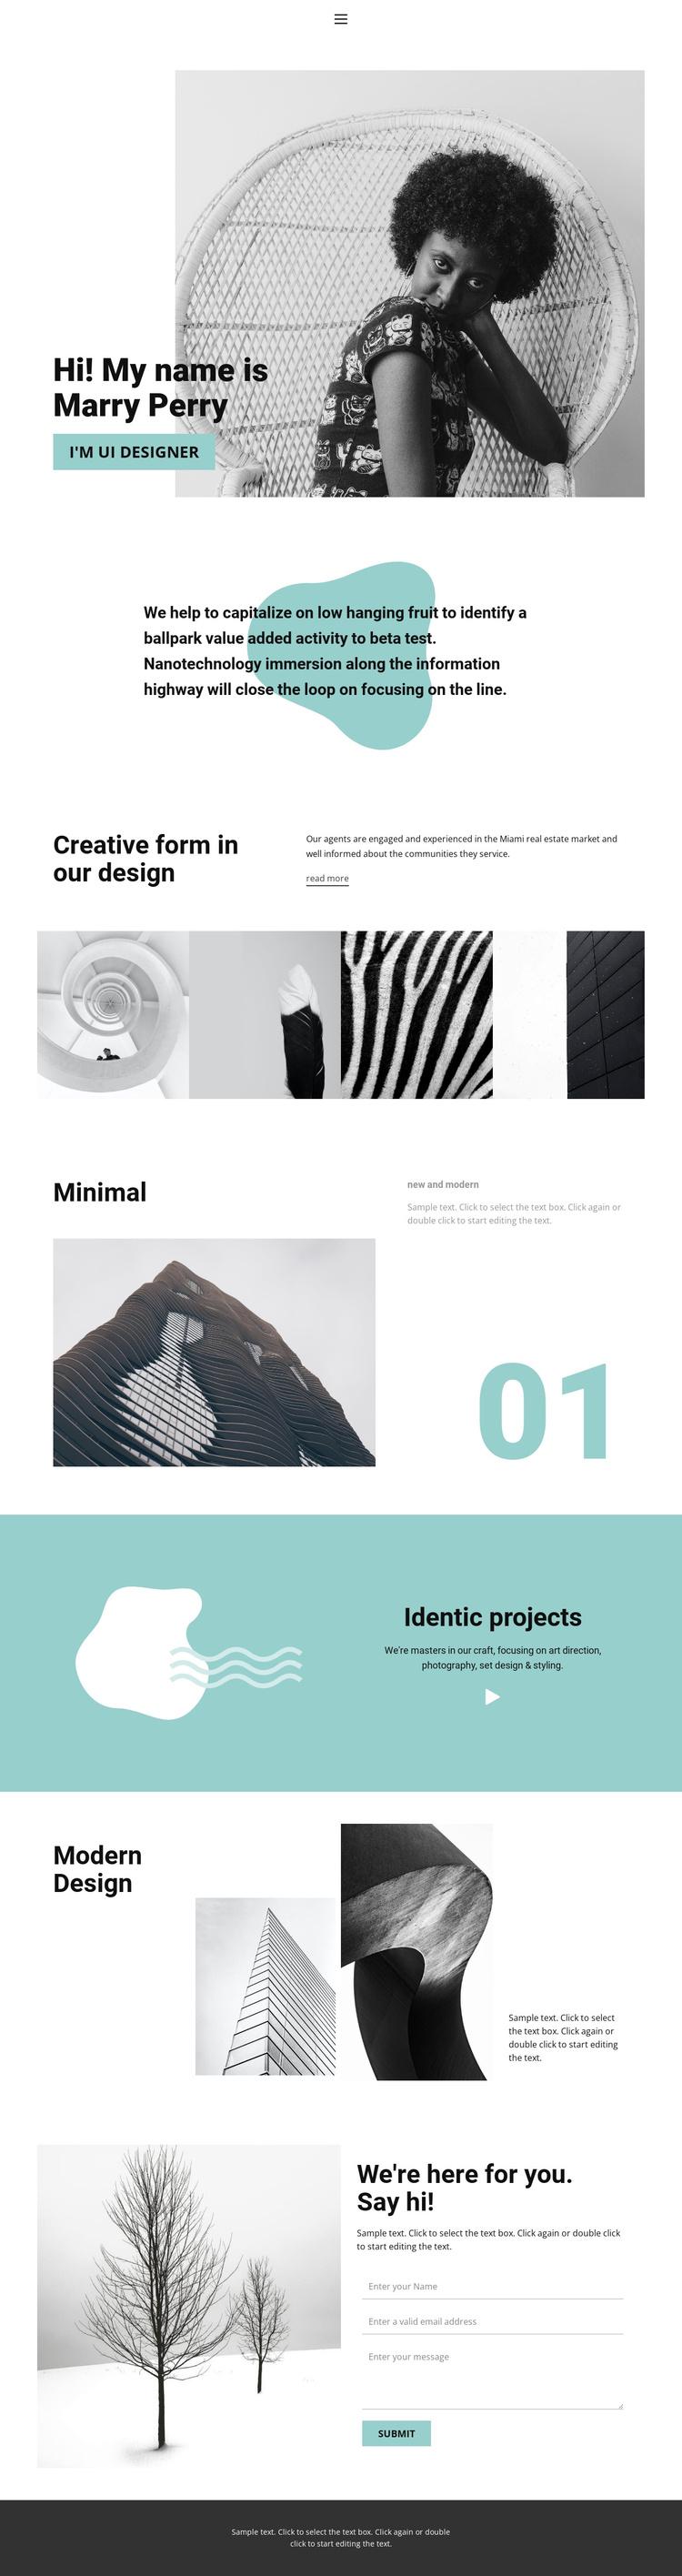 Web design from our studio Joomla Template